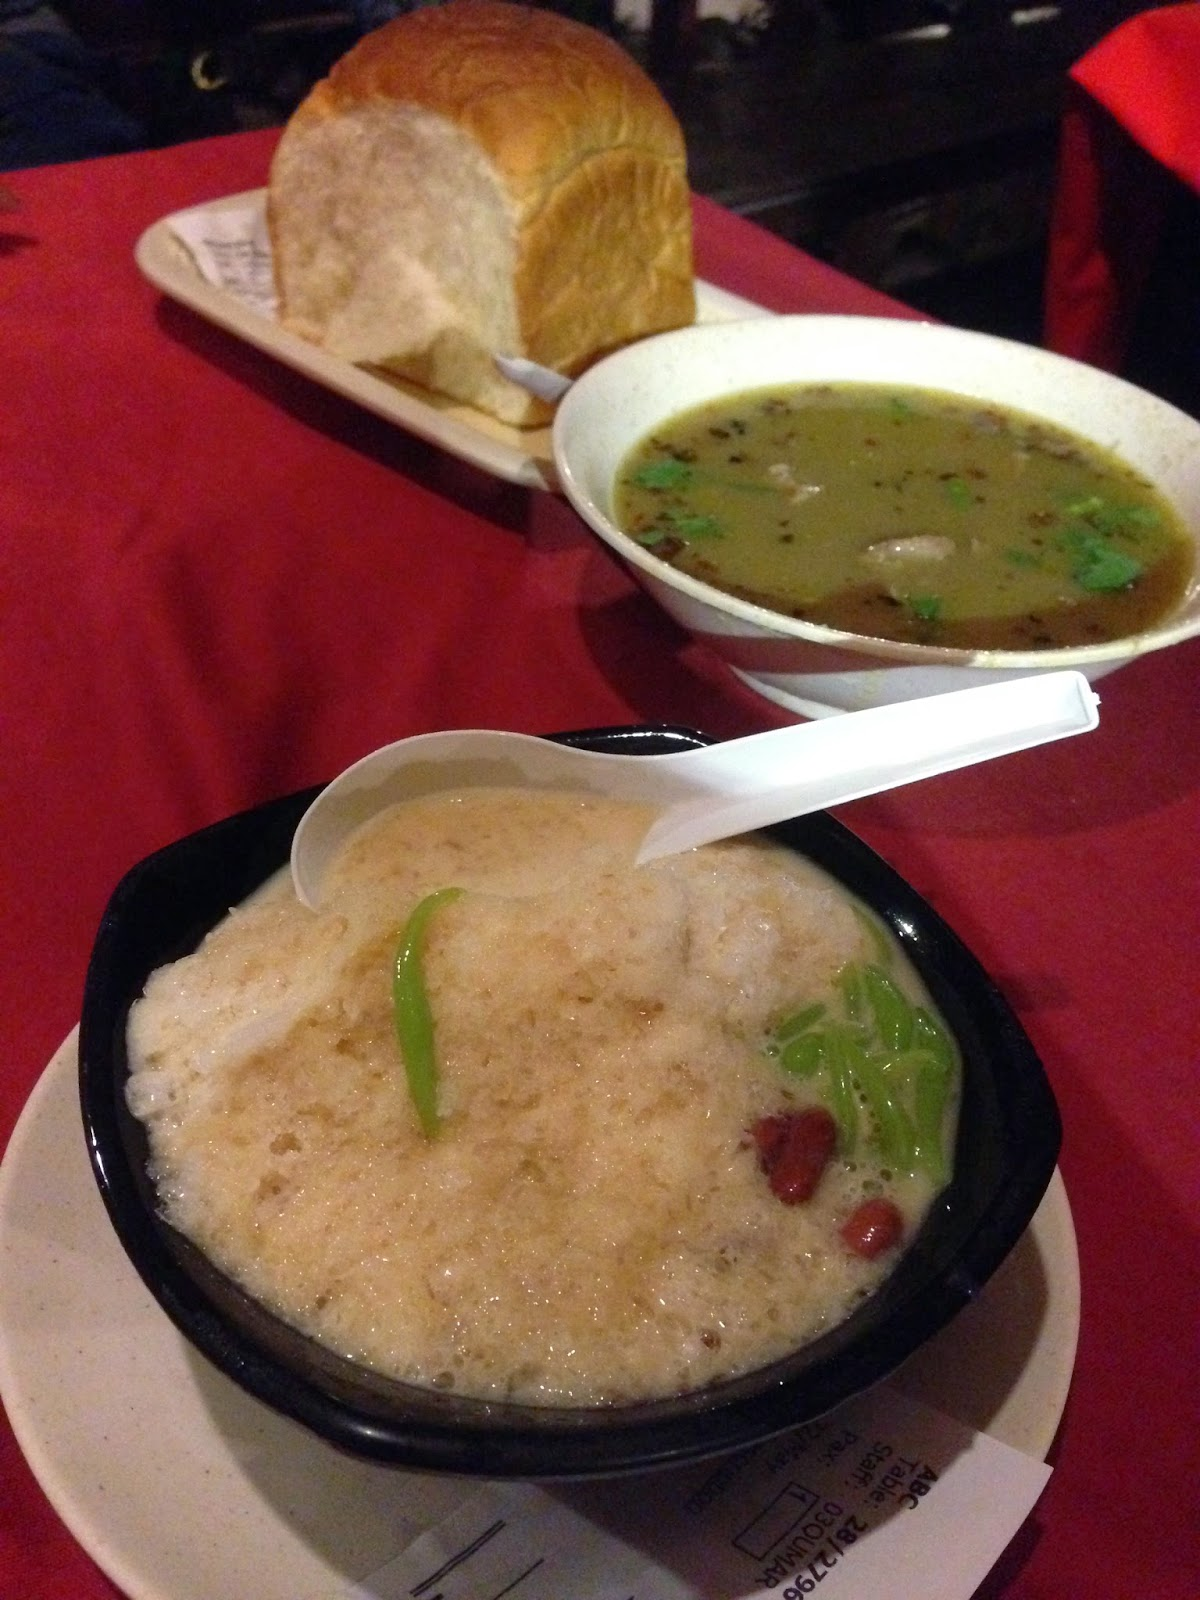 Cendol at Puncak Mutiara Cafe